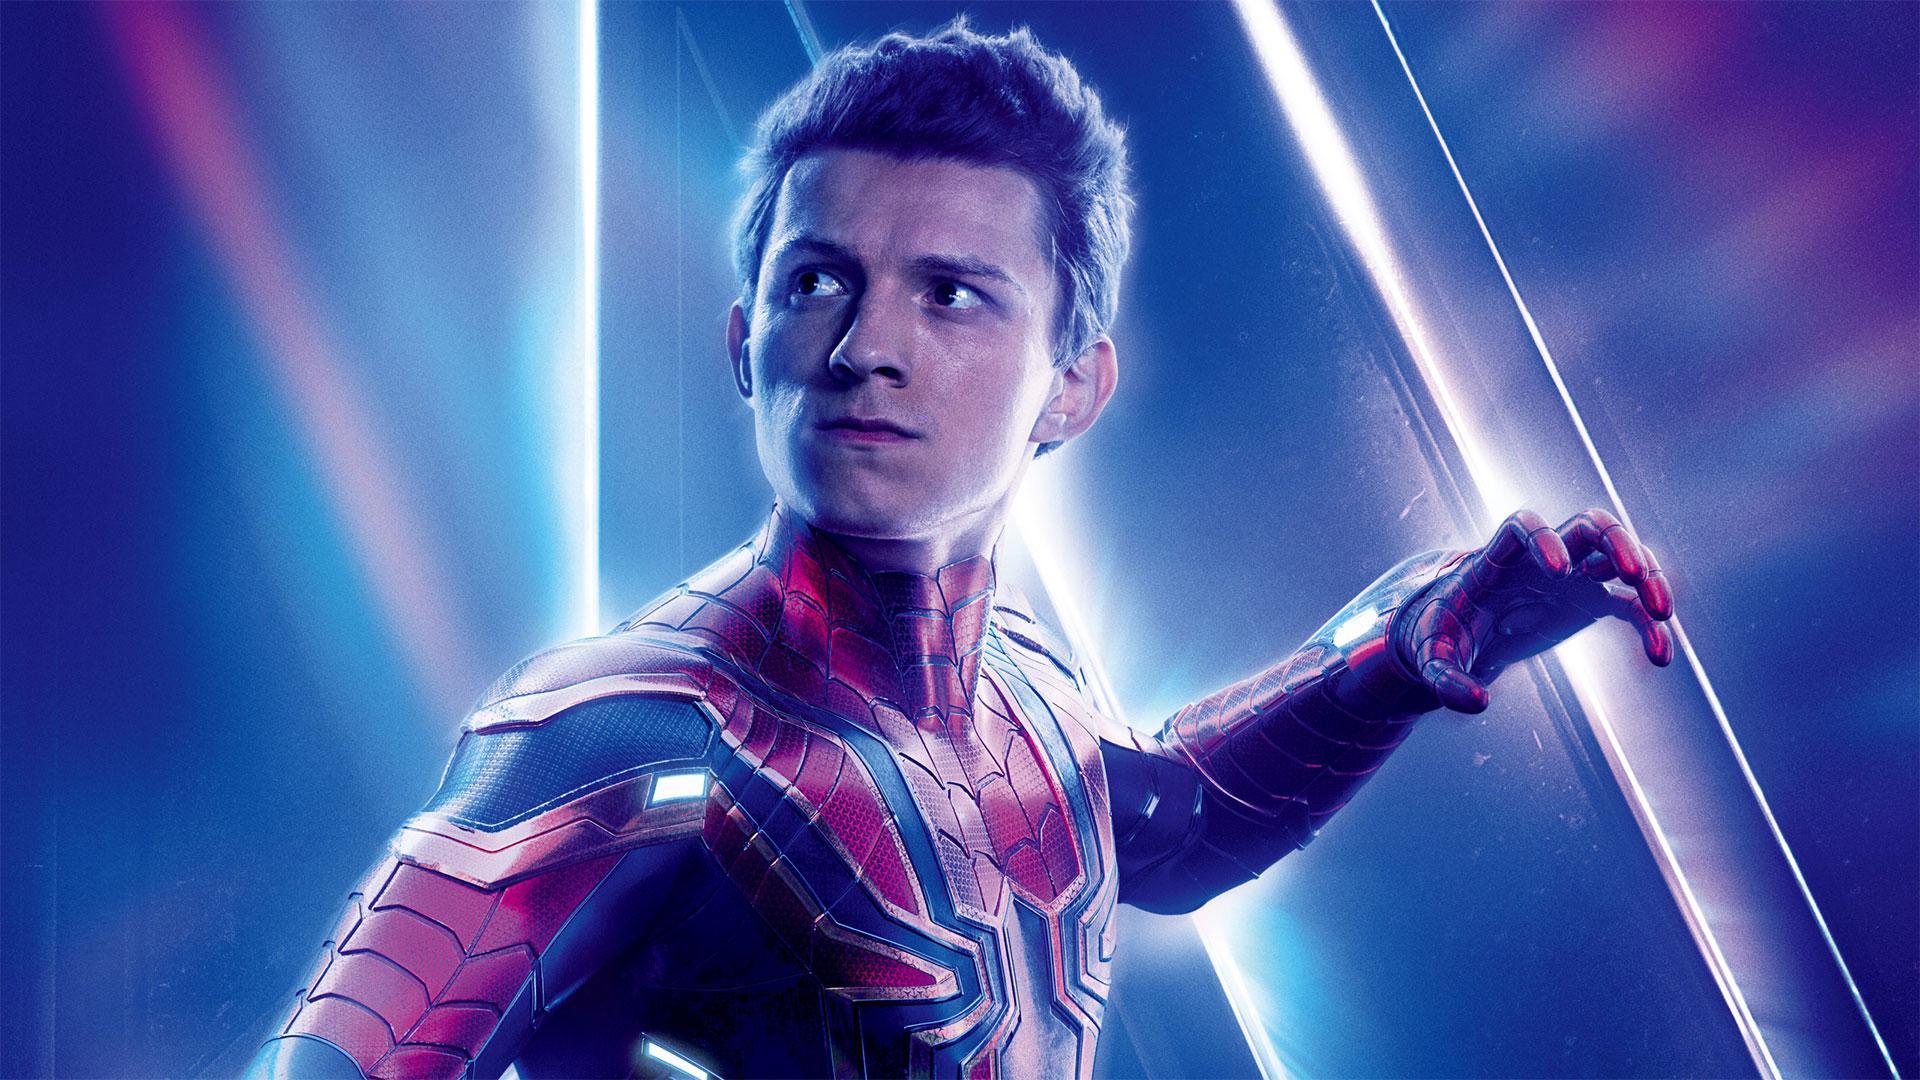 Iron Man Avengers Endgame Wallpaper Hd Movie Poster Wallpaper